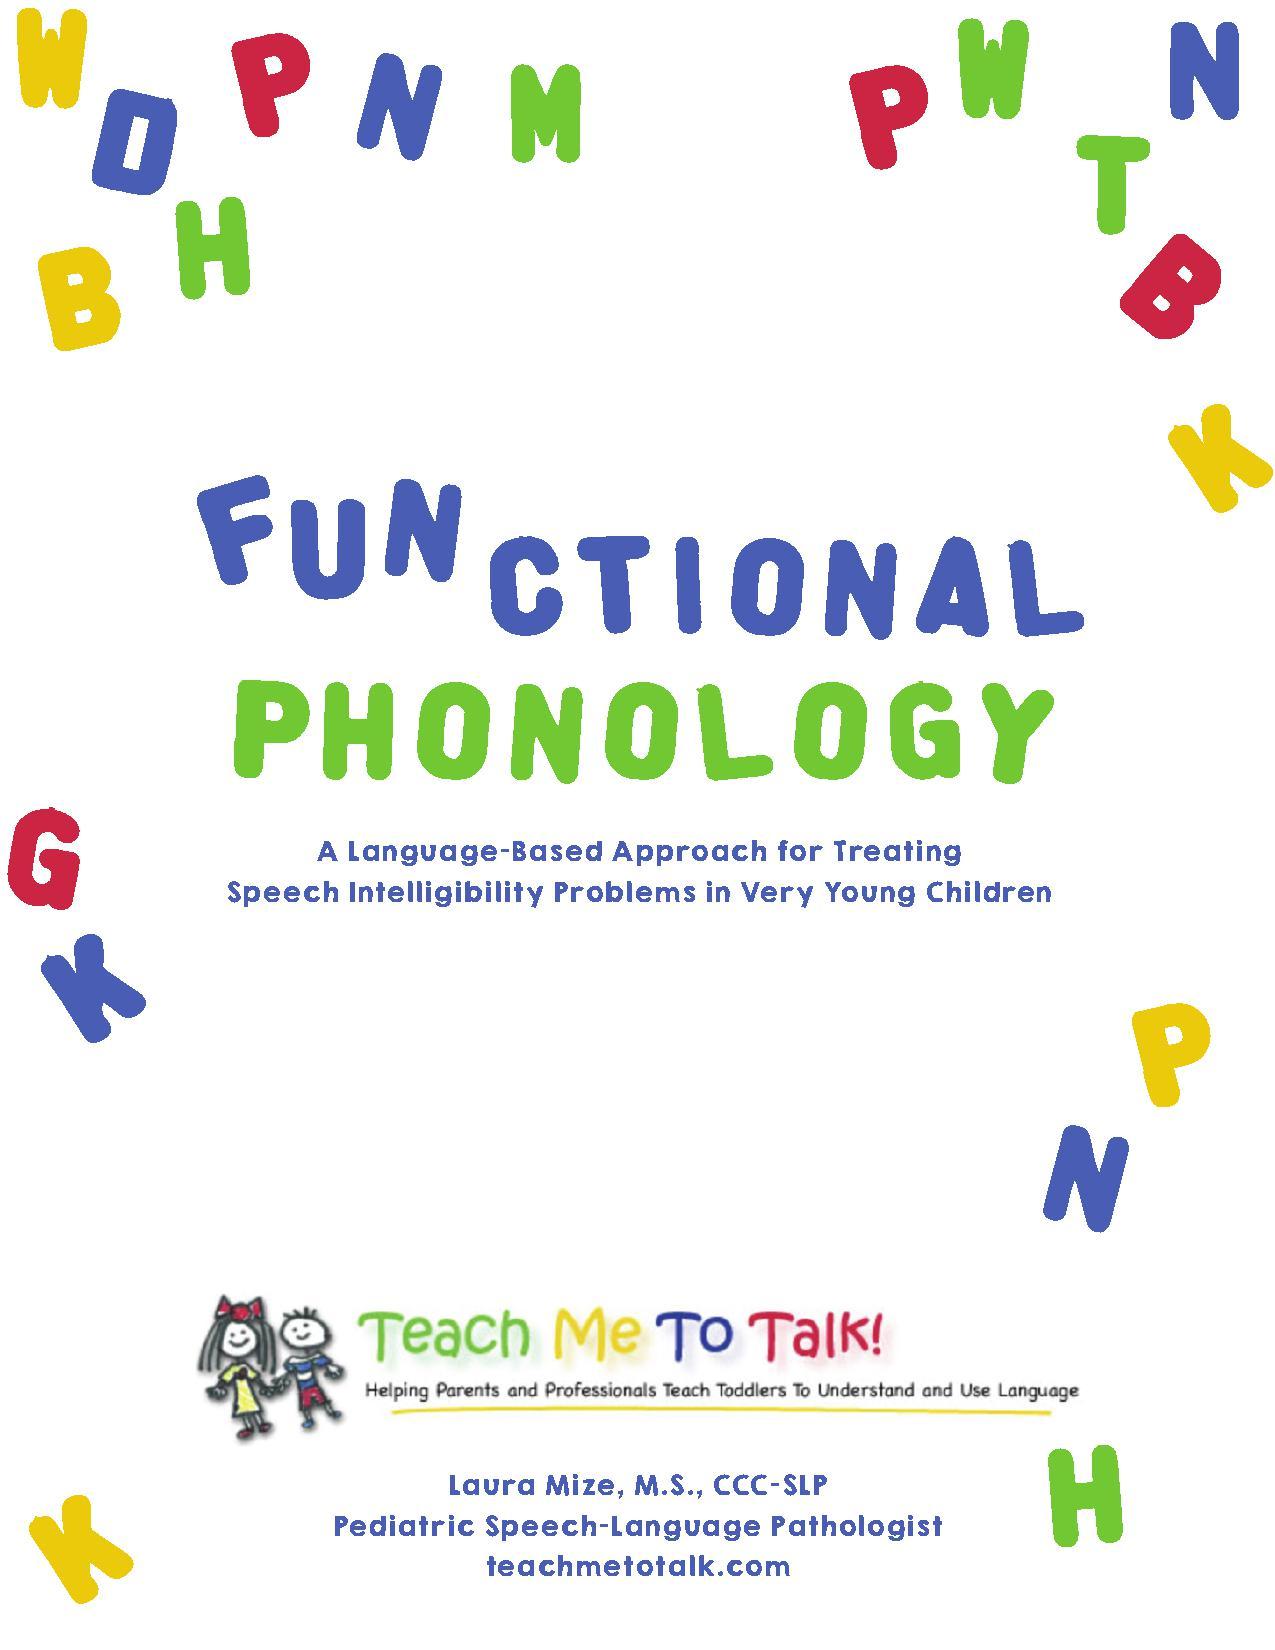 Functional-Phonology-Cover_1.jpg